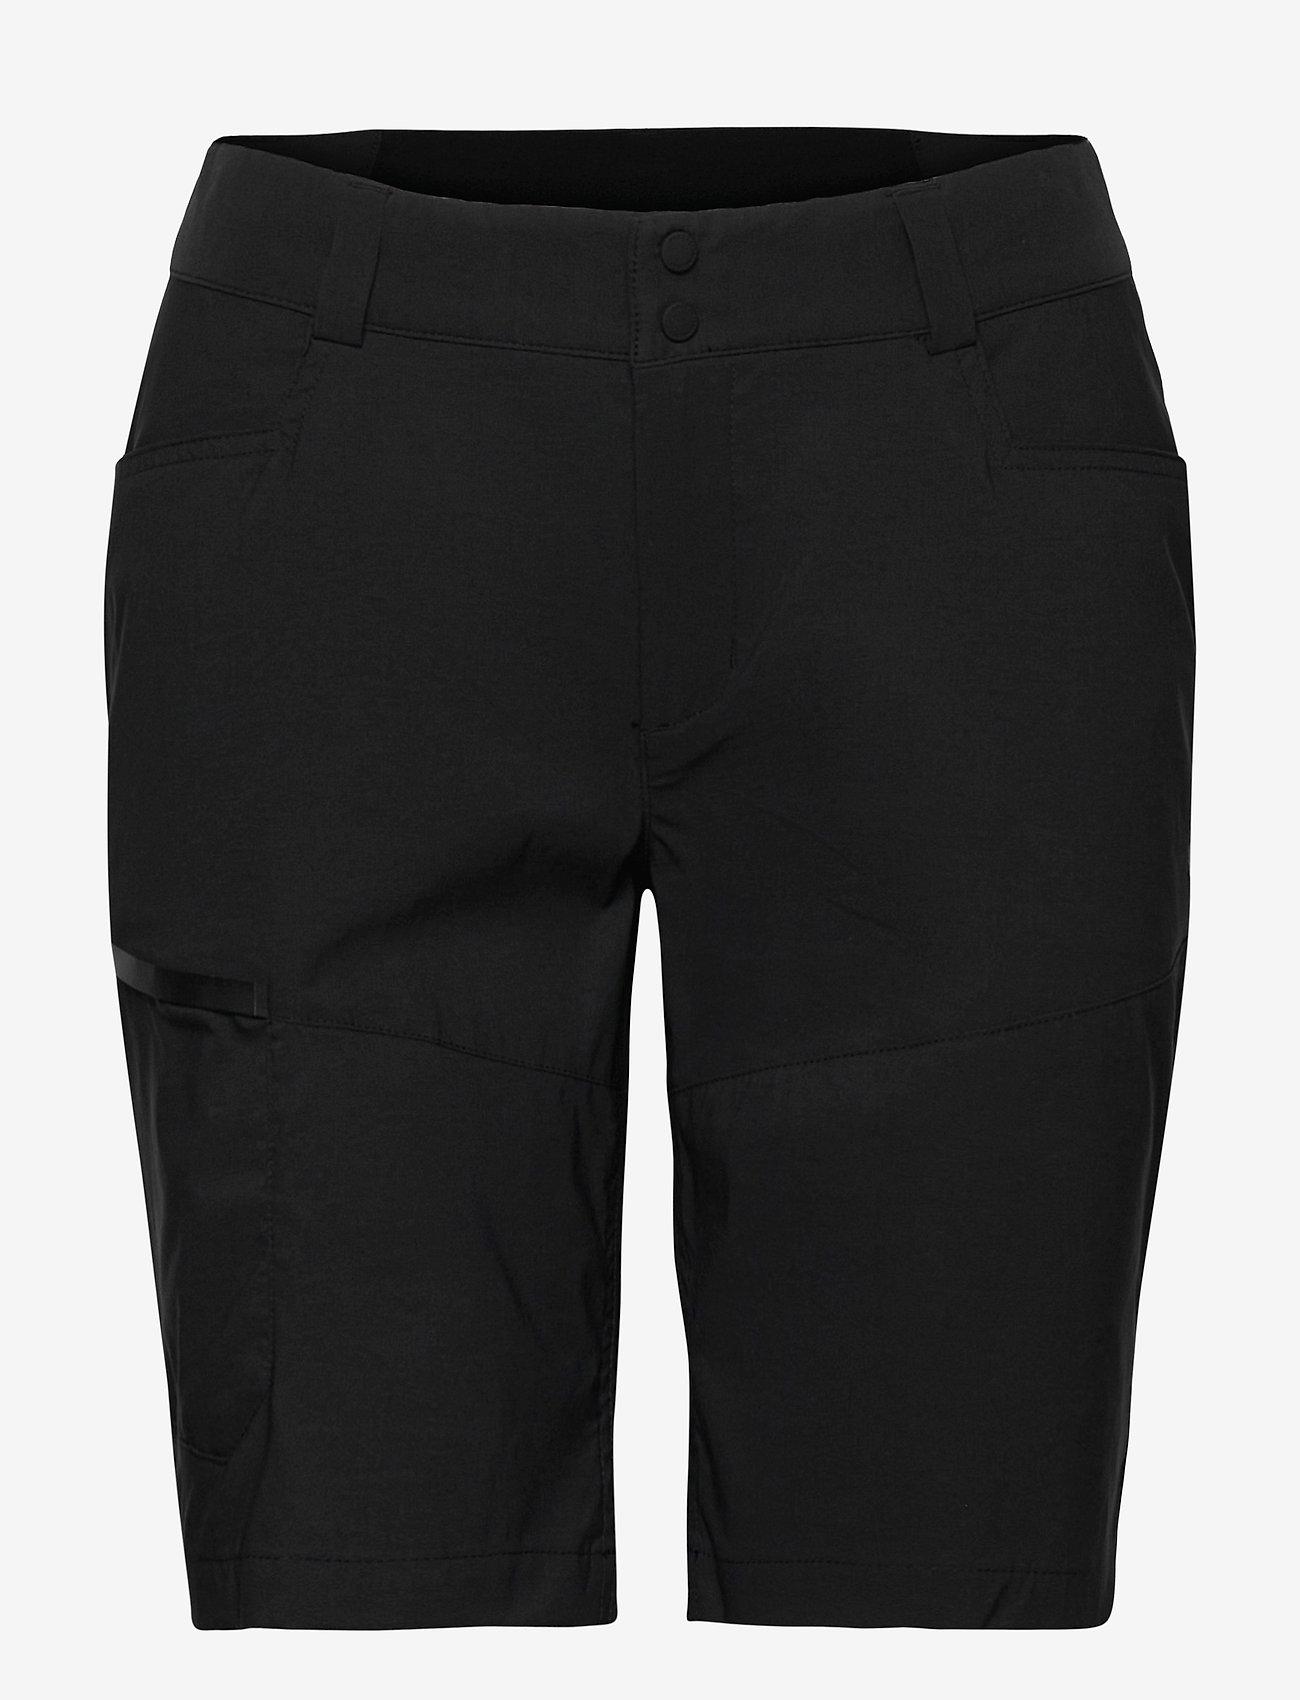 Peak Performance - W Iconiq Long shorts - short de randonnée - black - 0